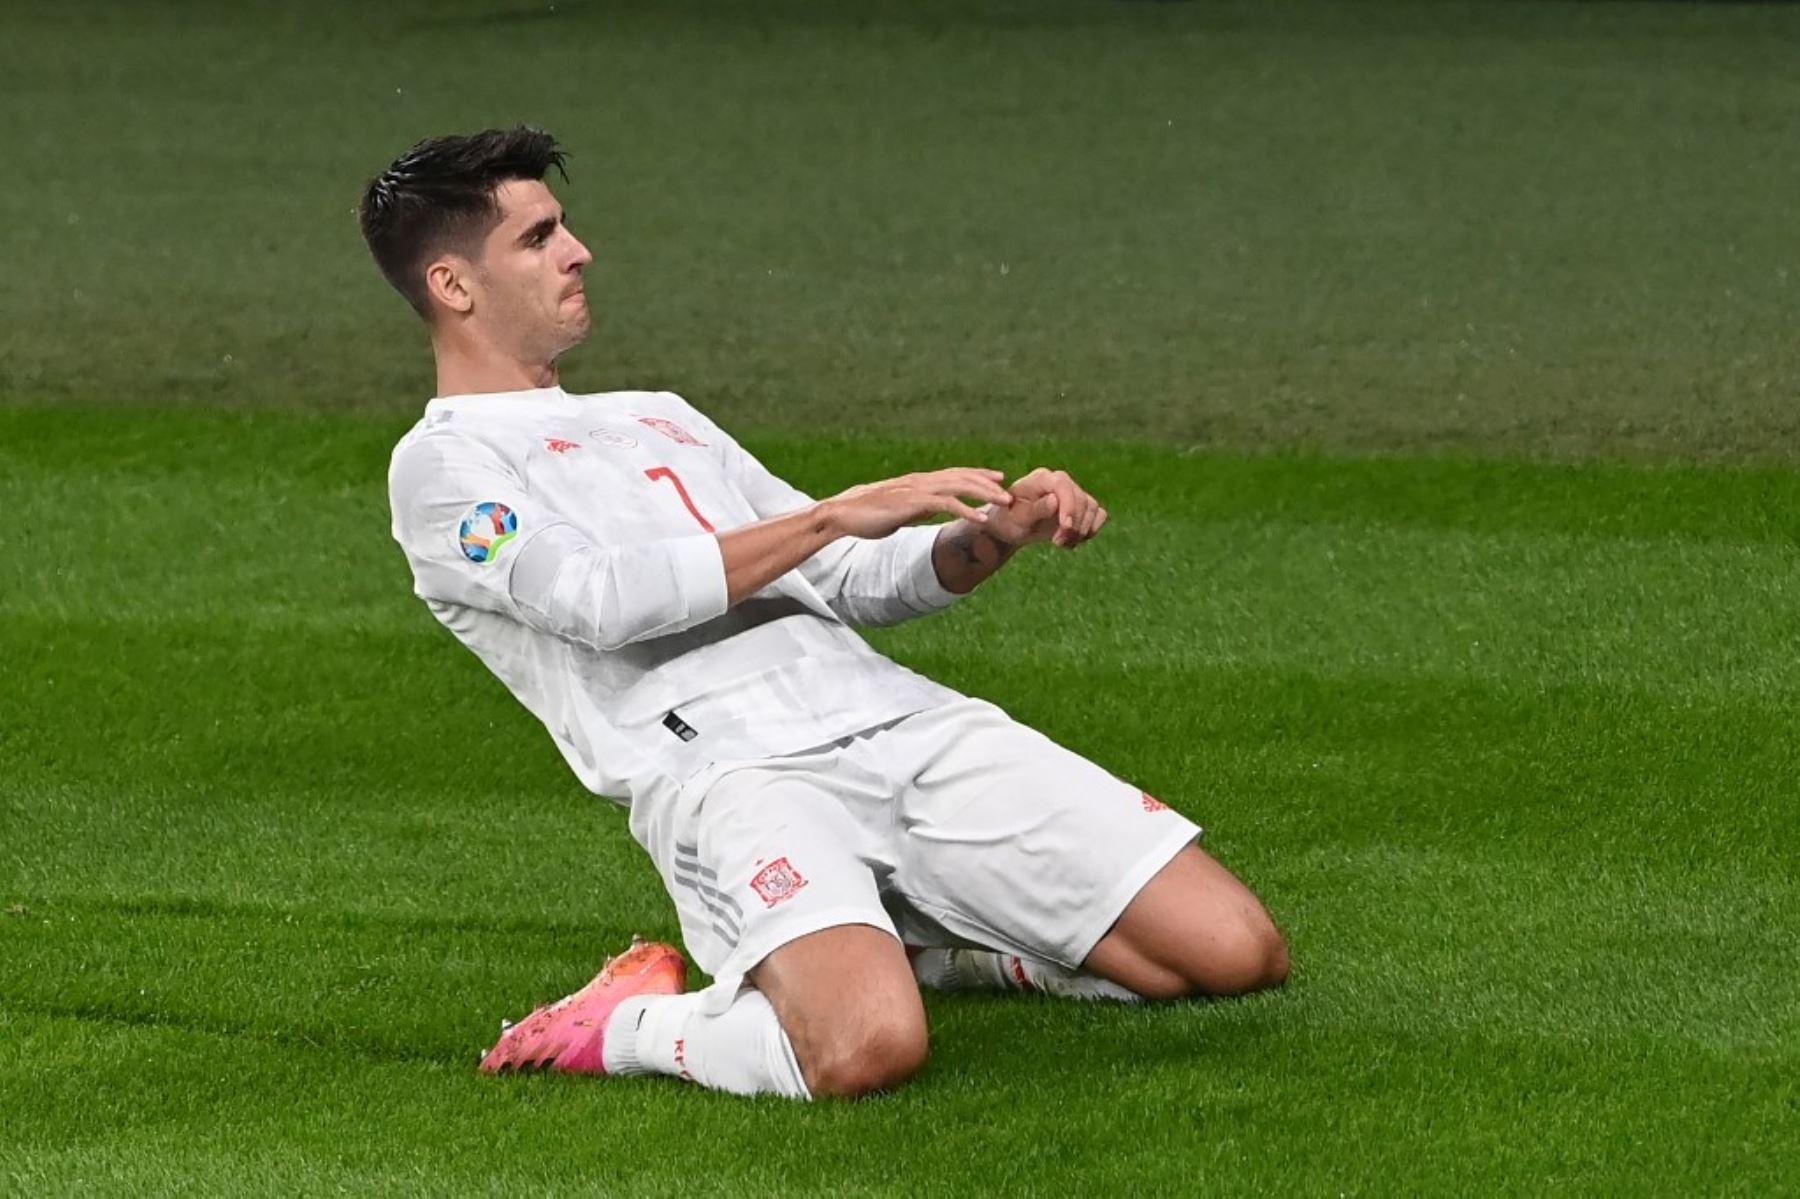 Italia empata 1-1 con  España en la prórroga en Wembley